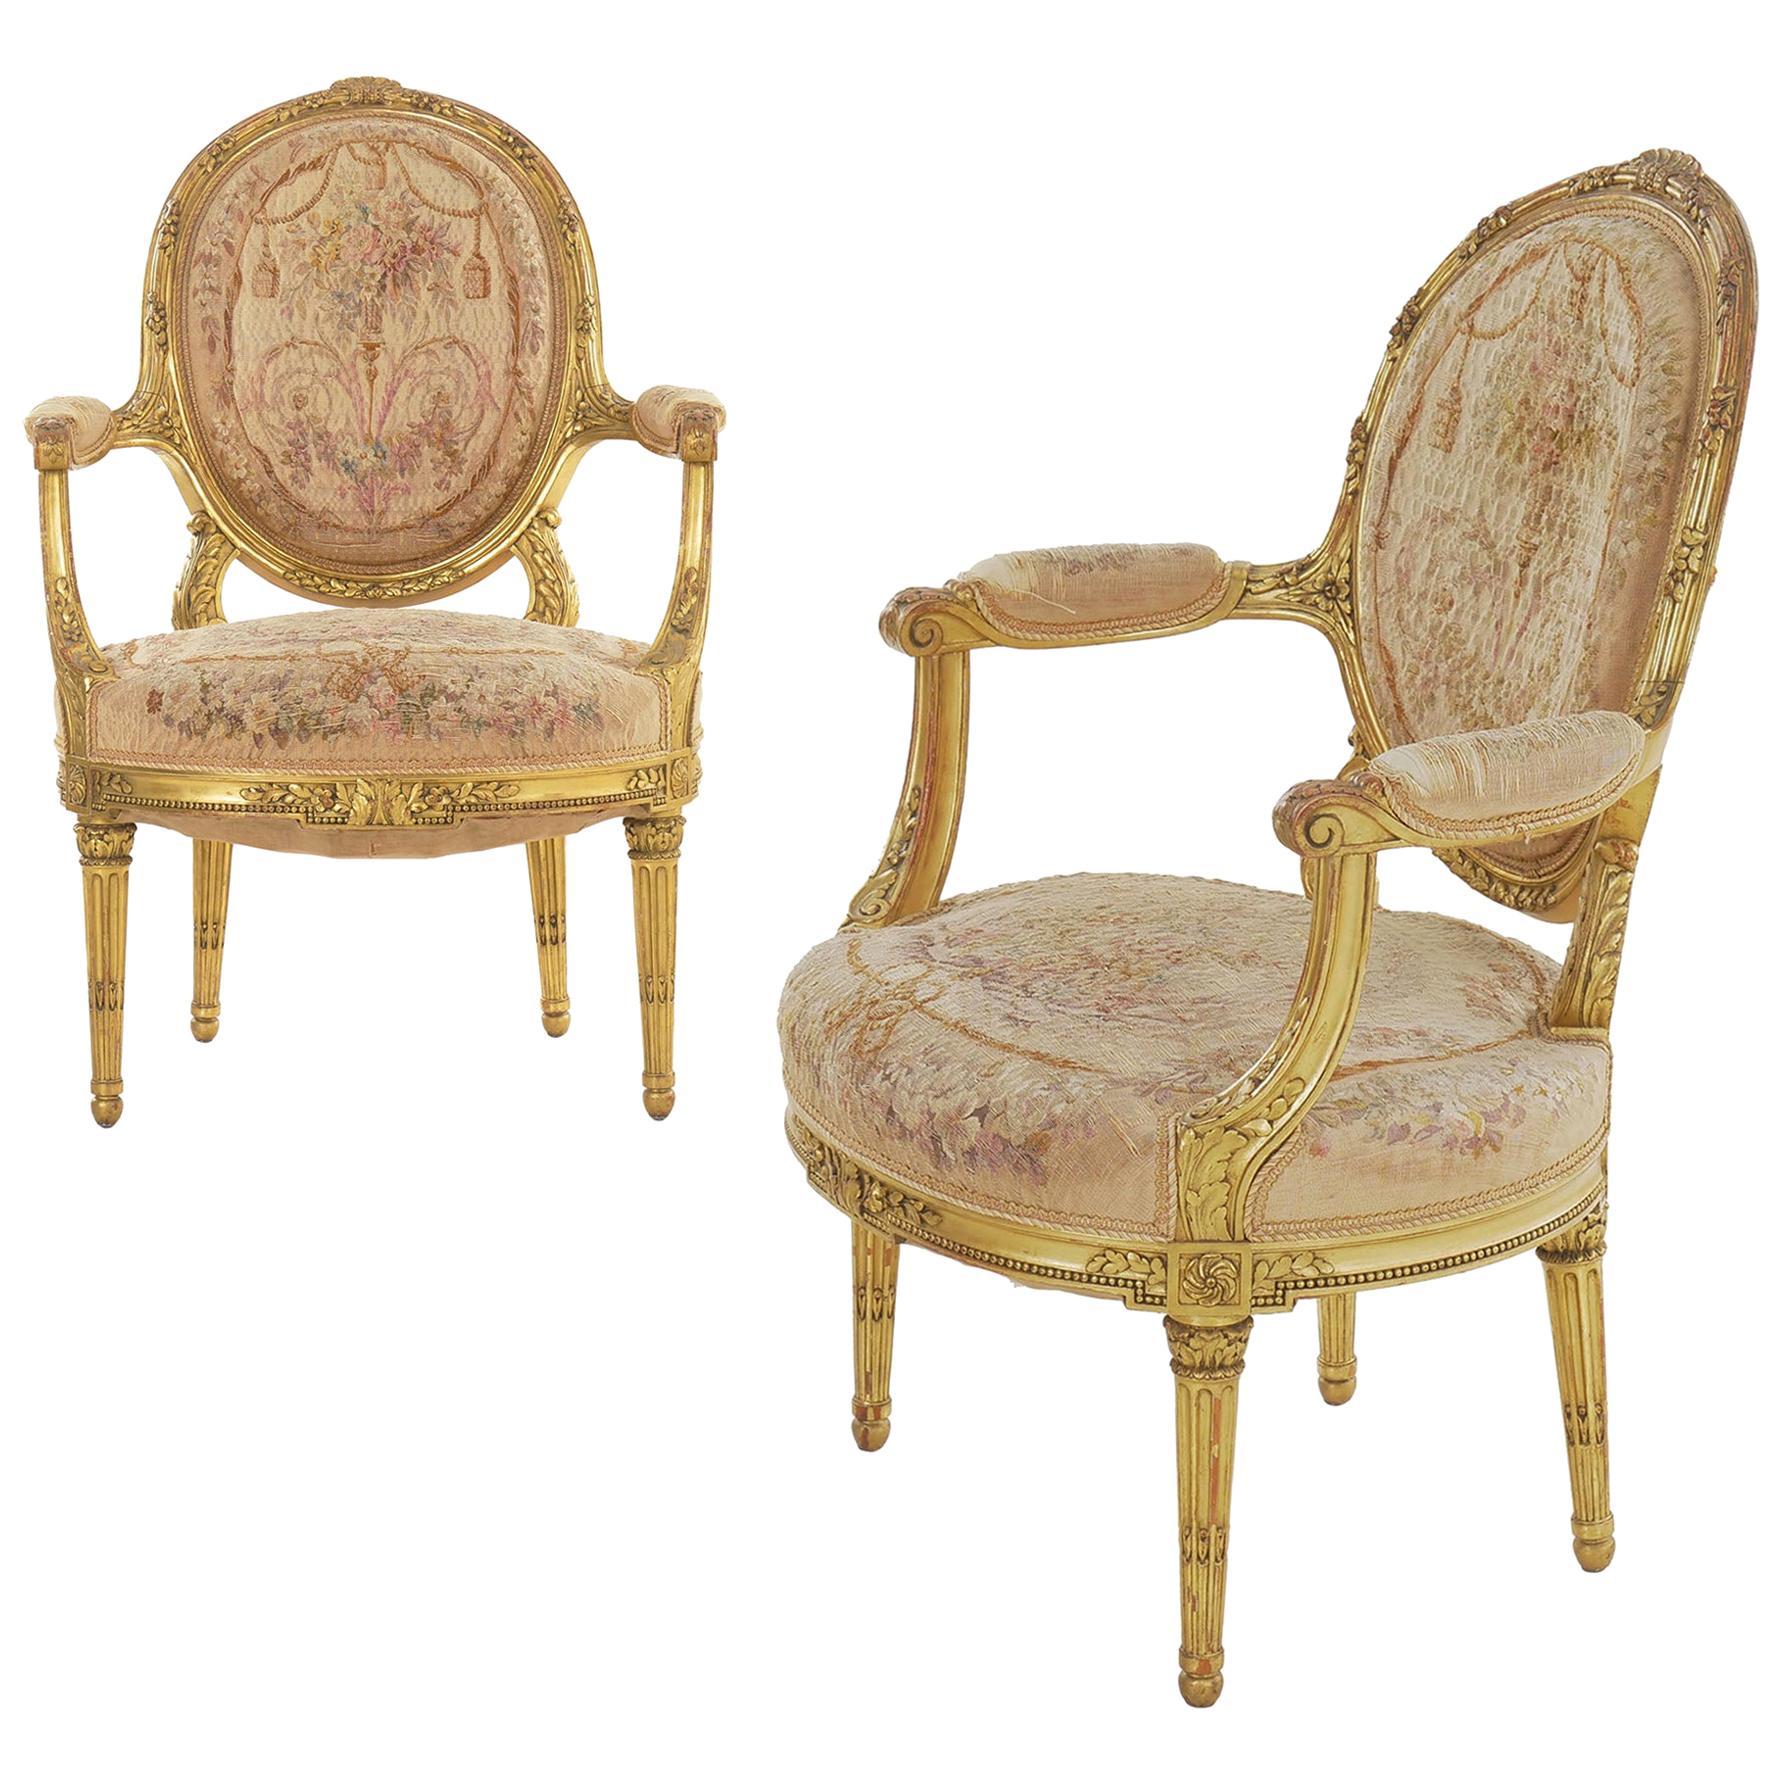 Pair of French Louis XVI Style Giltwood Antique Armchairs, Paris, circa 1900